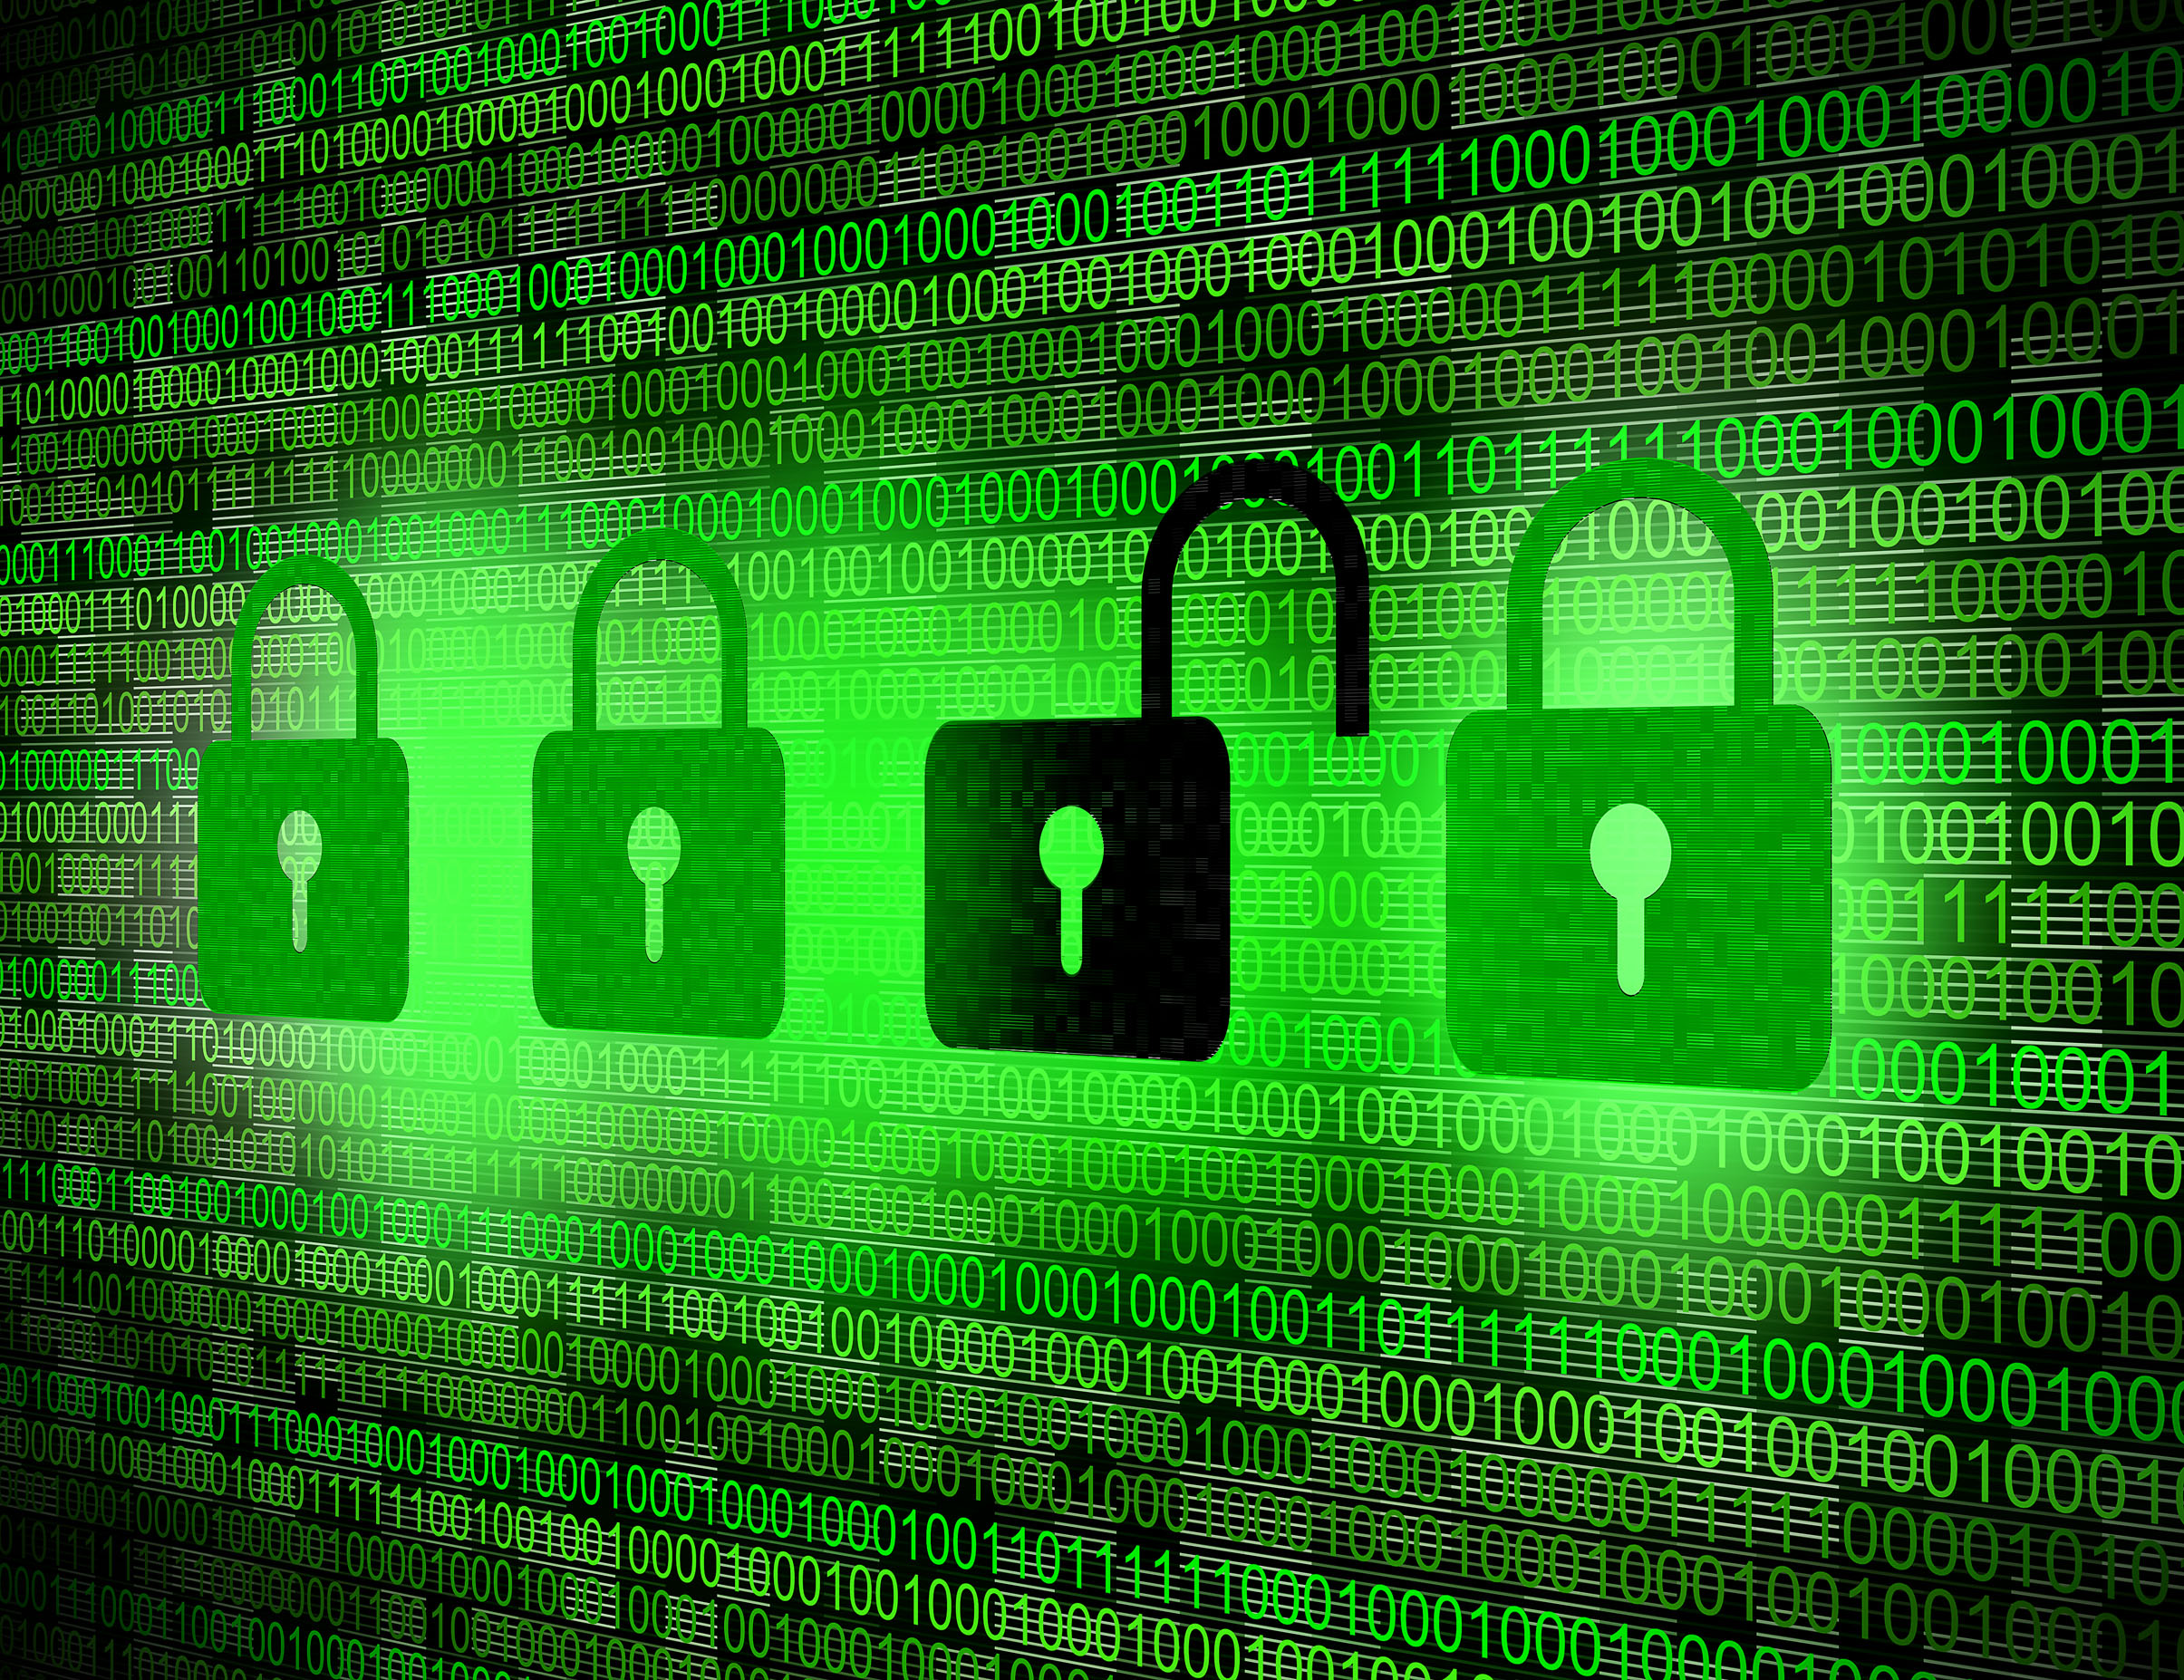 Security concept - Locks on digital screen